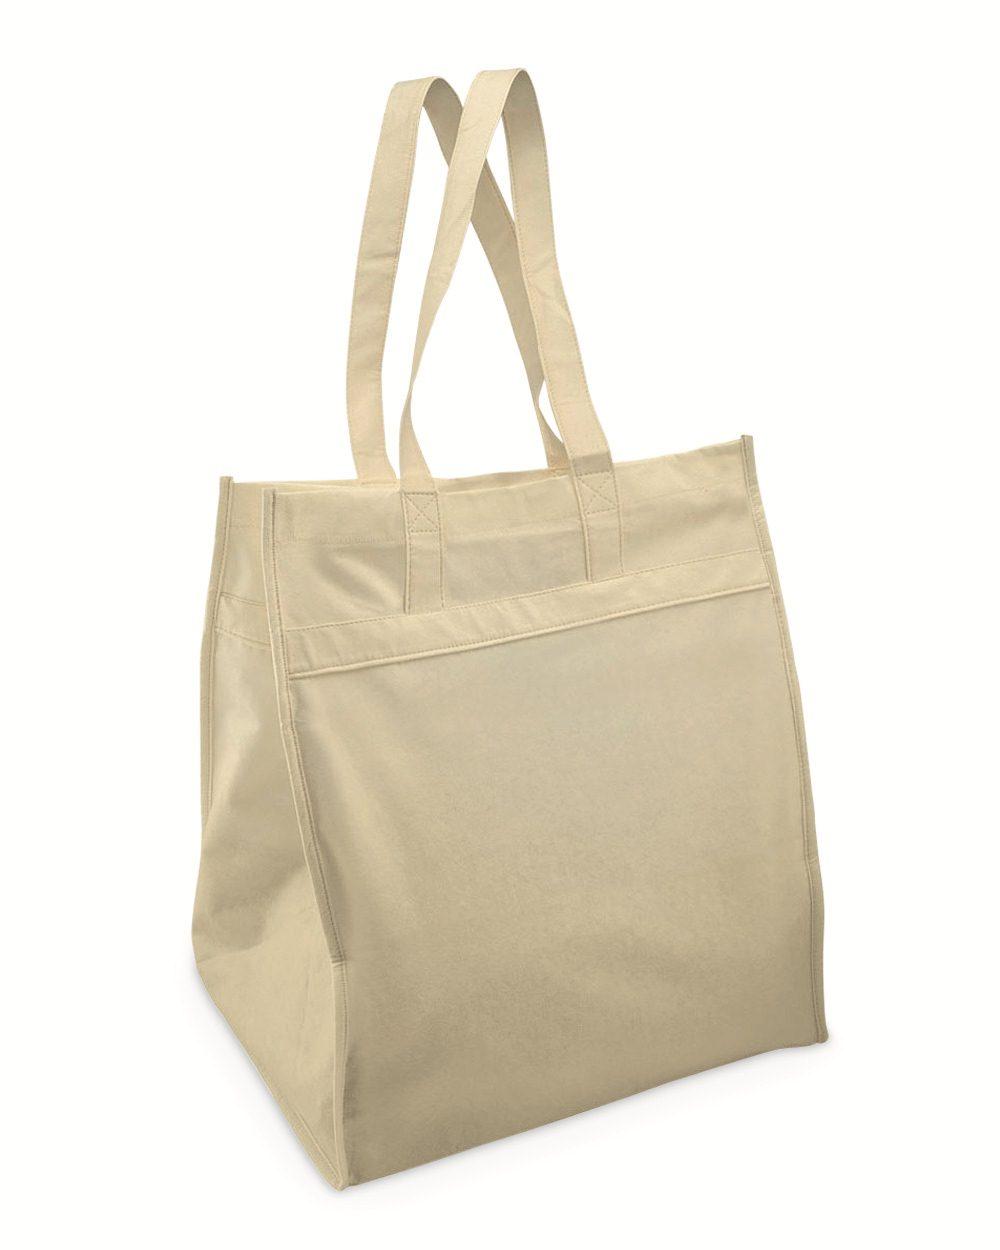 Valubag Bamboo Shopping Bag - VB0916